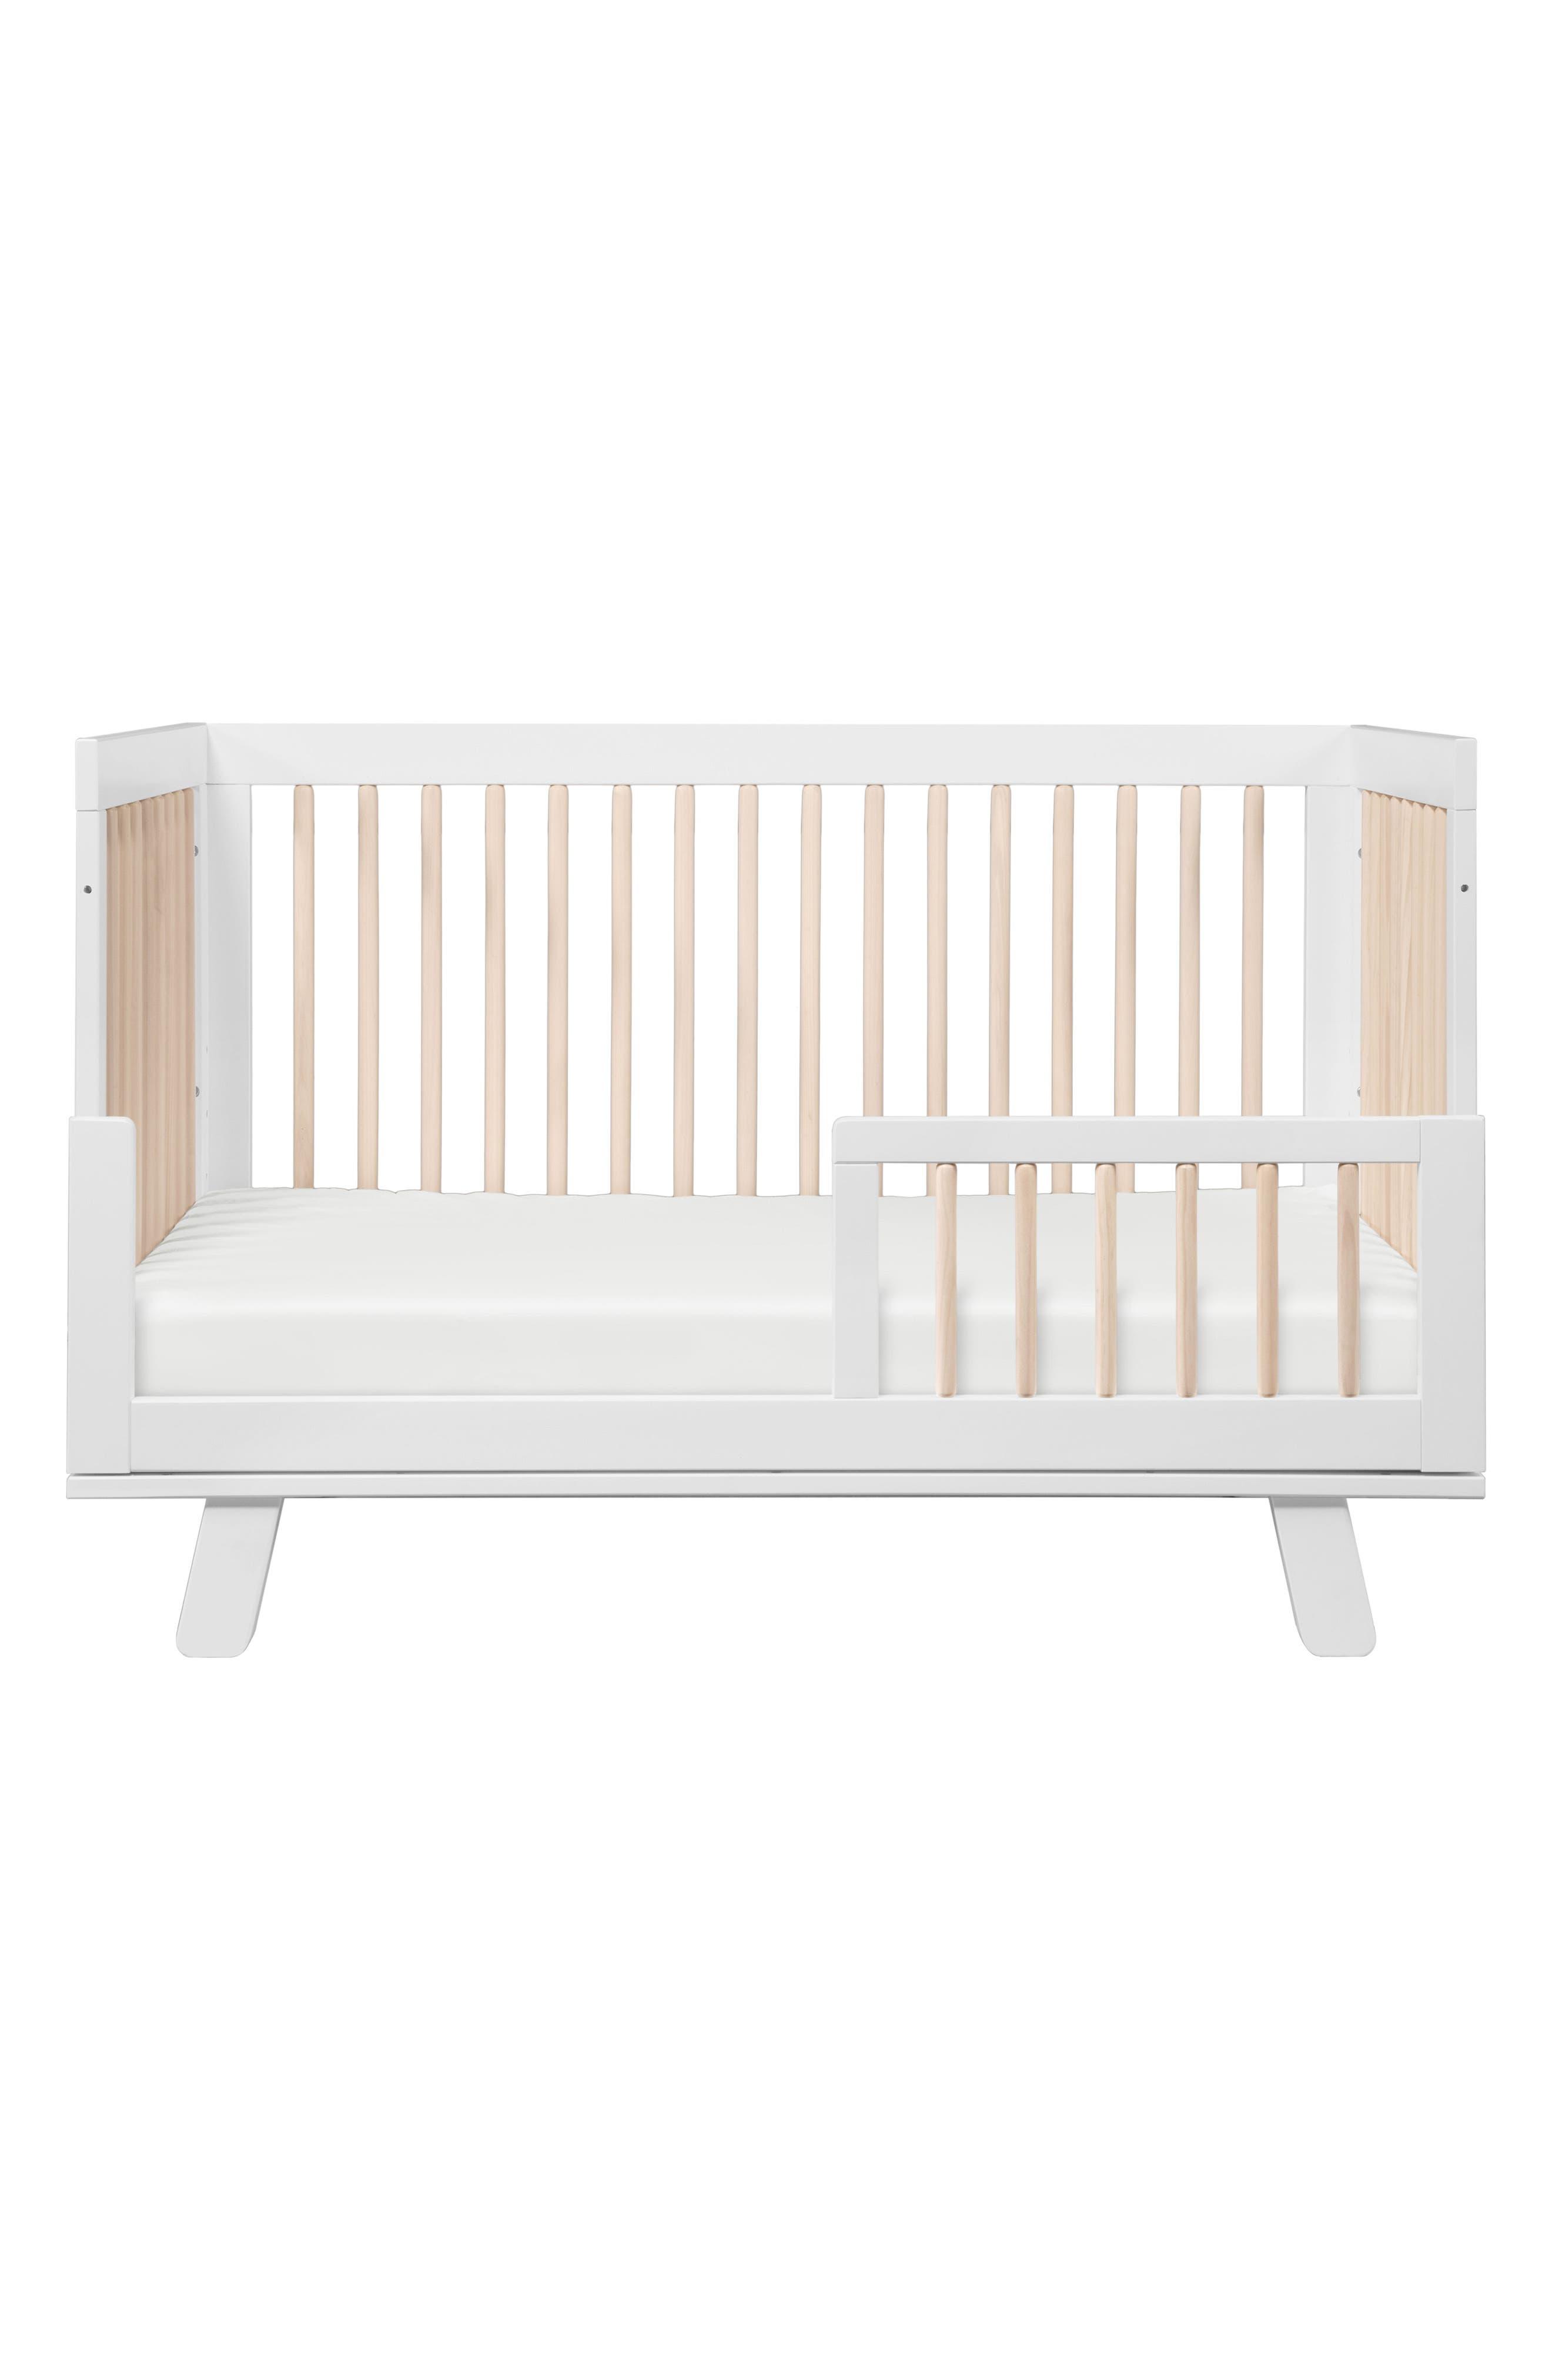 'Hudson' 3-in-1 Convertible Crib,                             Alternate thumbnail 21, color,